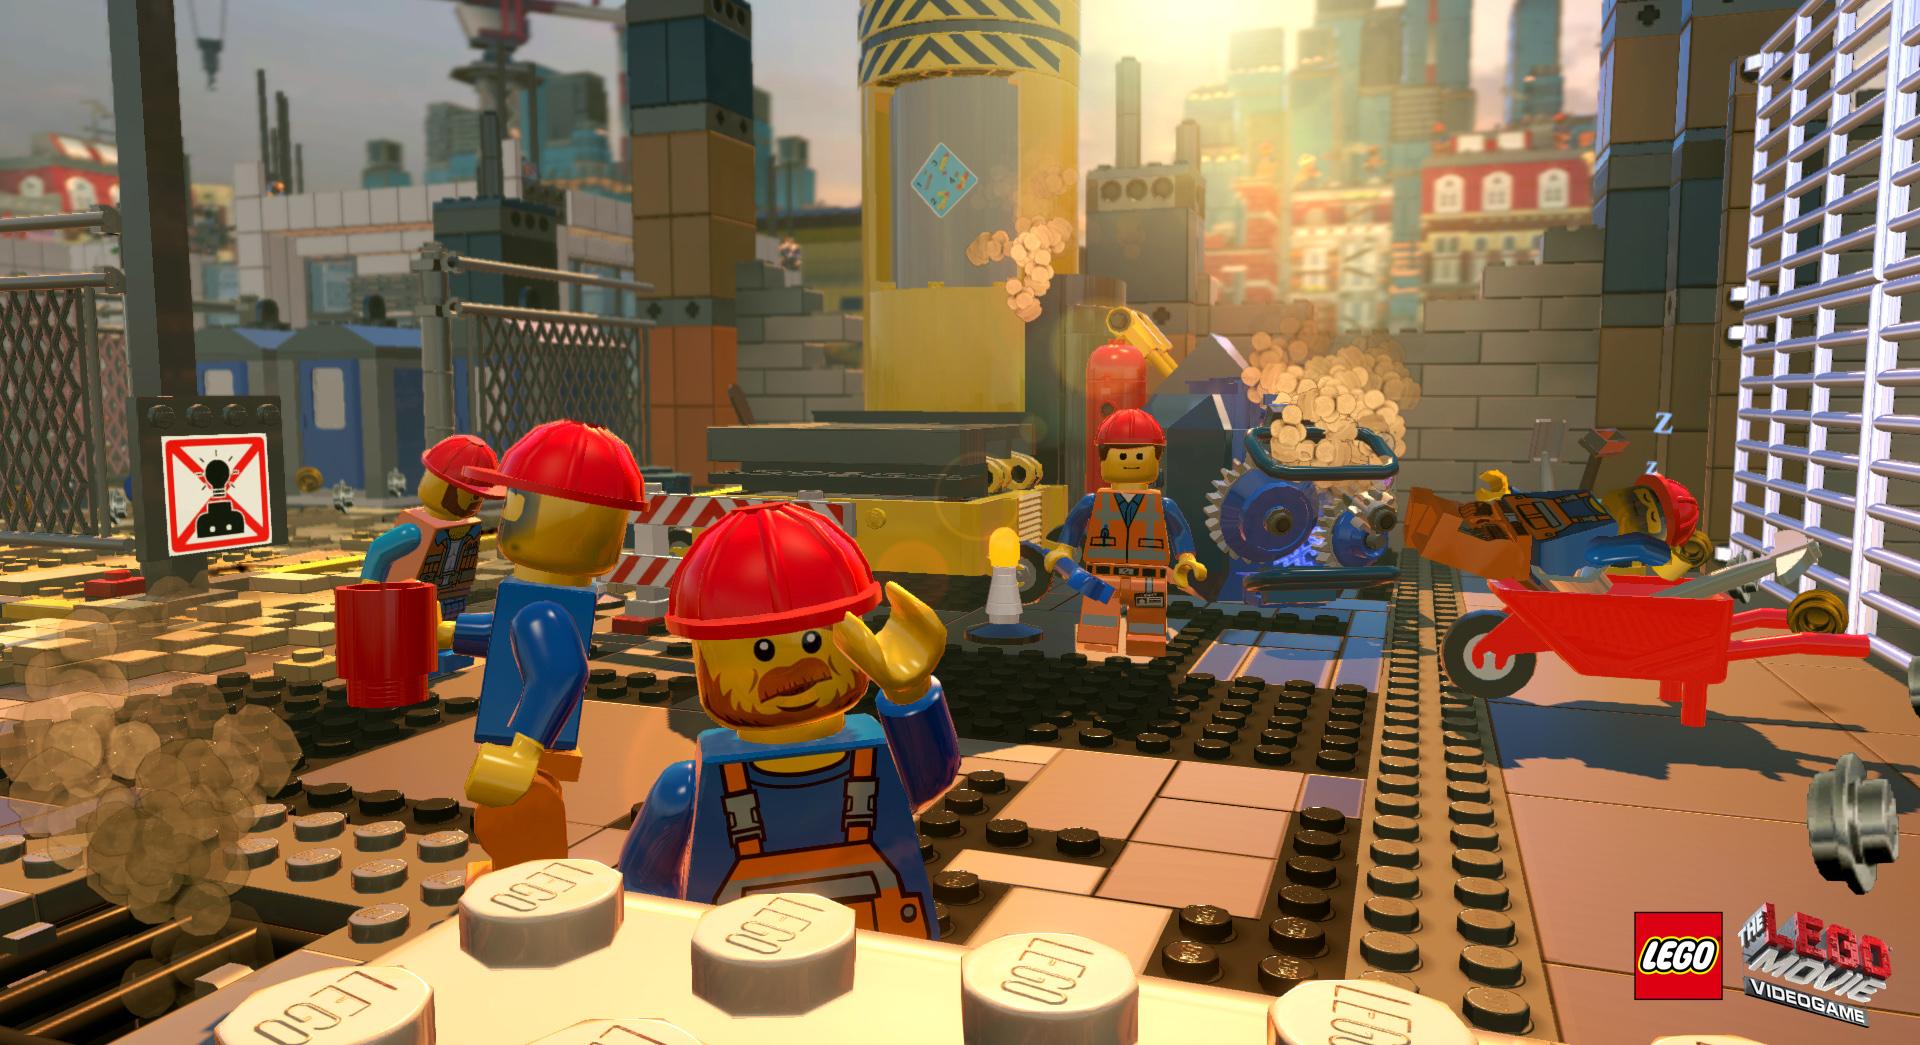 The LEGO Movie Videogame Tlm_bricksburg16_26490